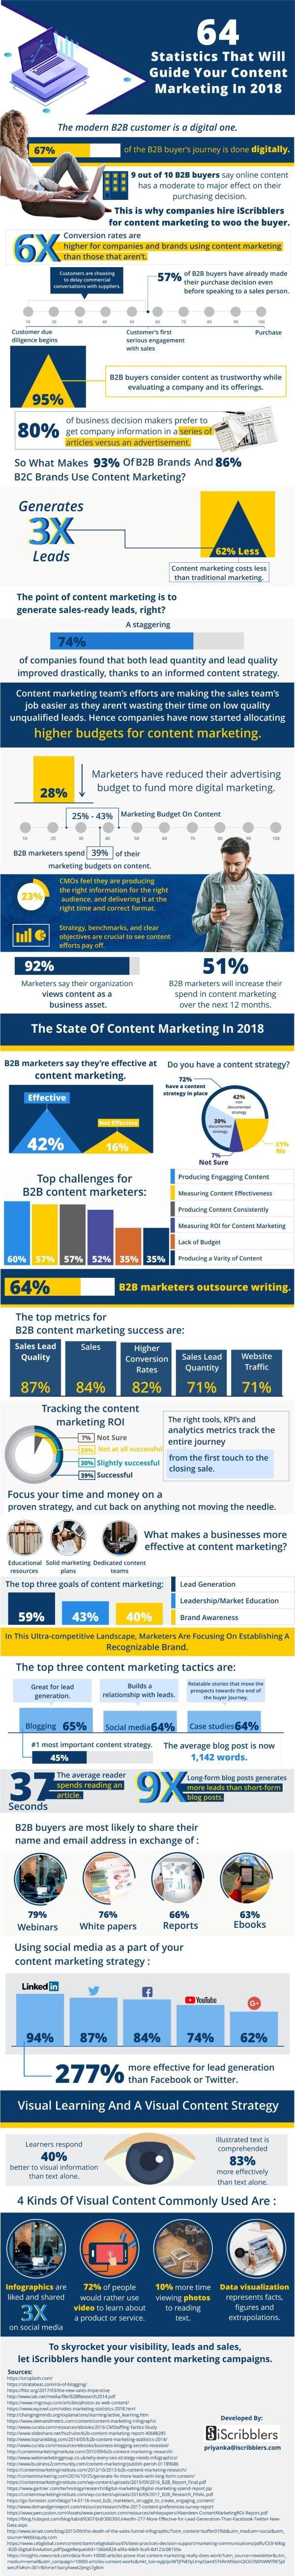 Content_Marketing_Statistics_Infographic